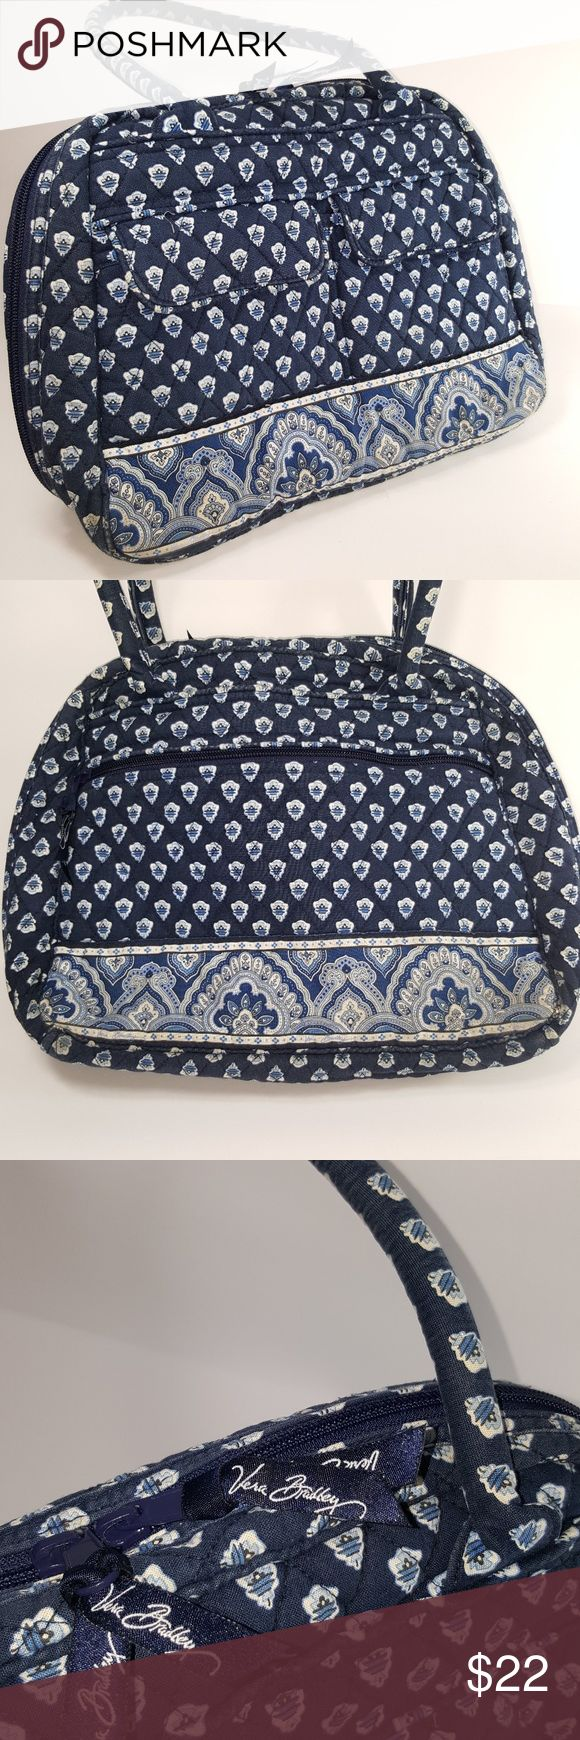 Vera Bradley blue and white tote bag Vera Bradley blue and white tote bag Vera Bradley Bags Travel Bags